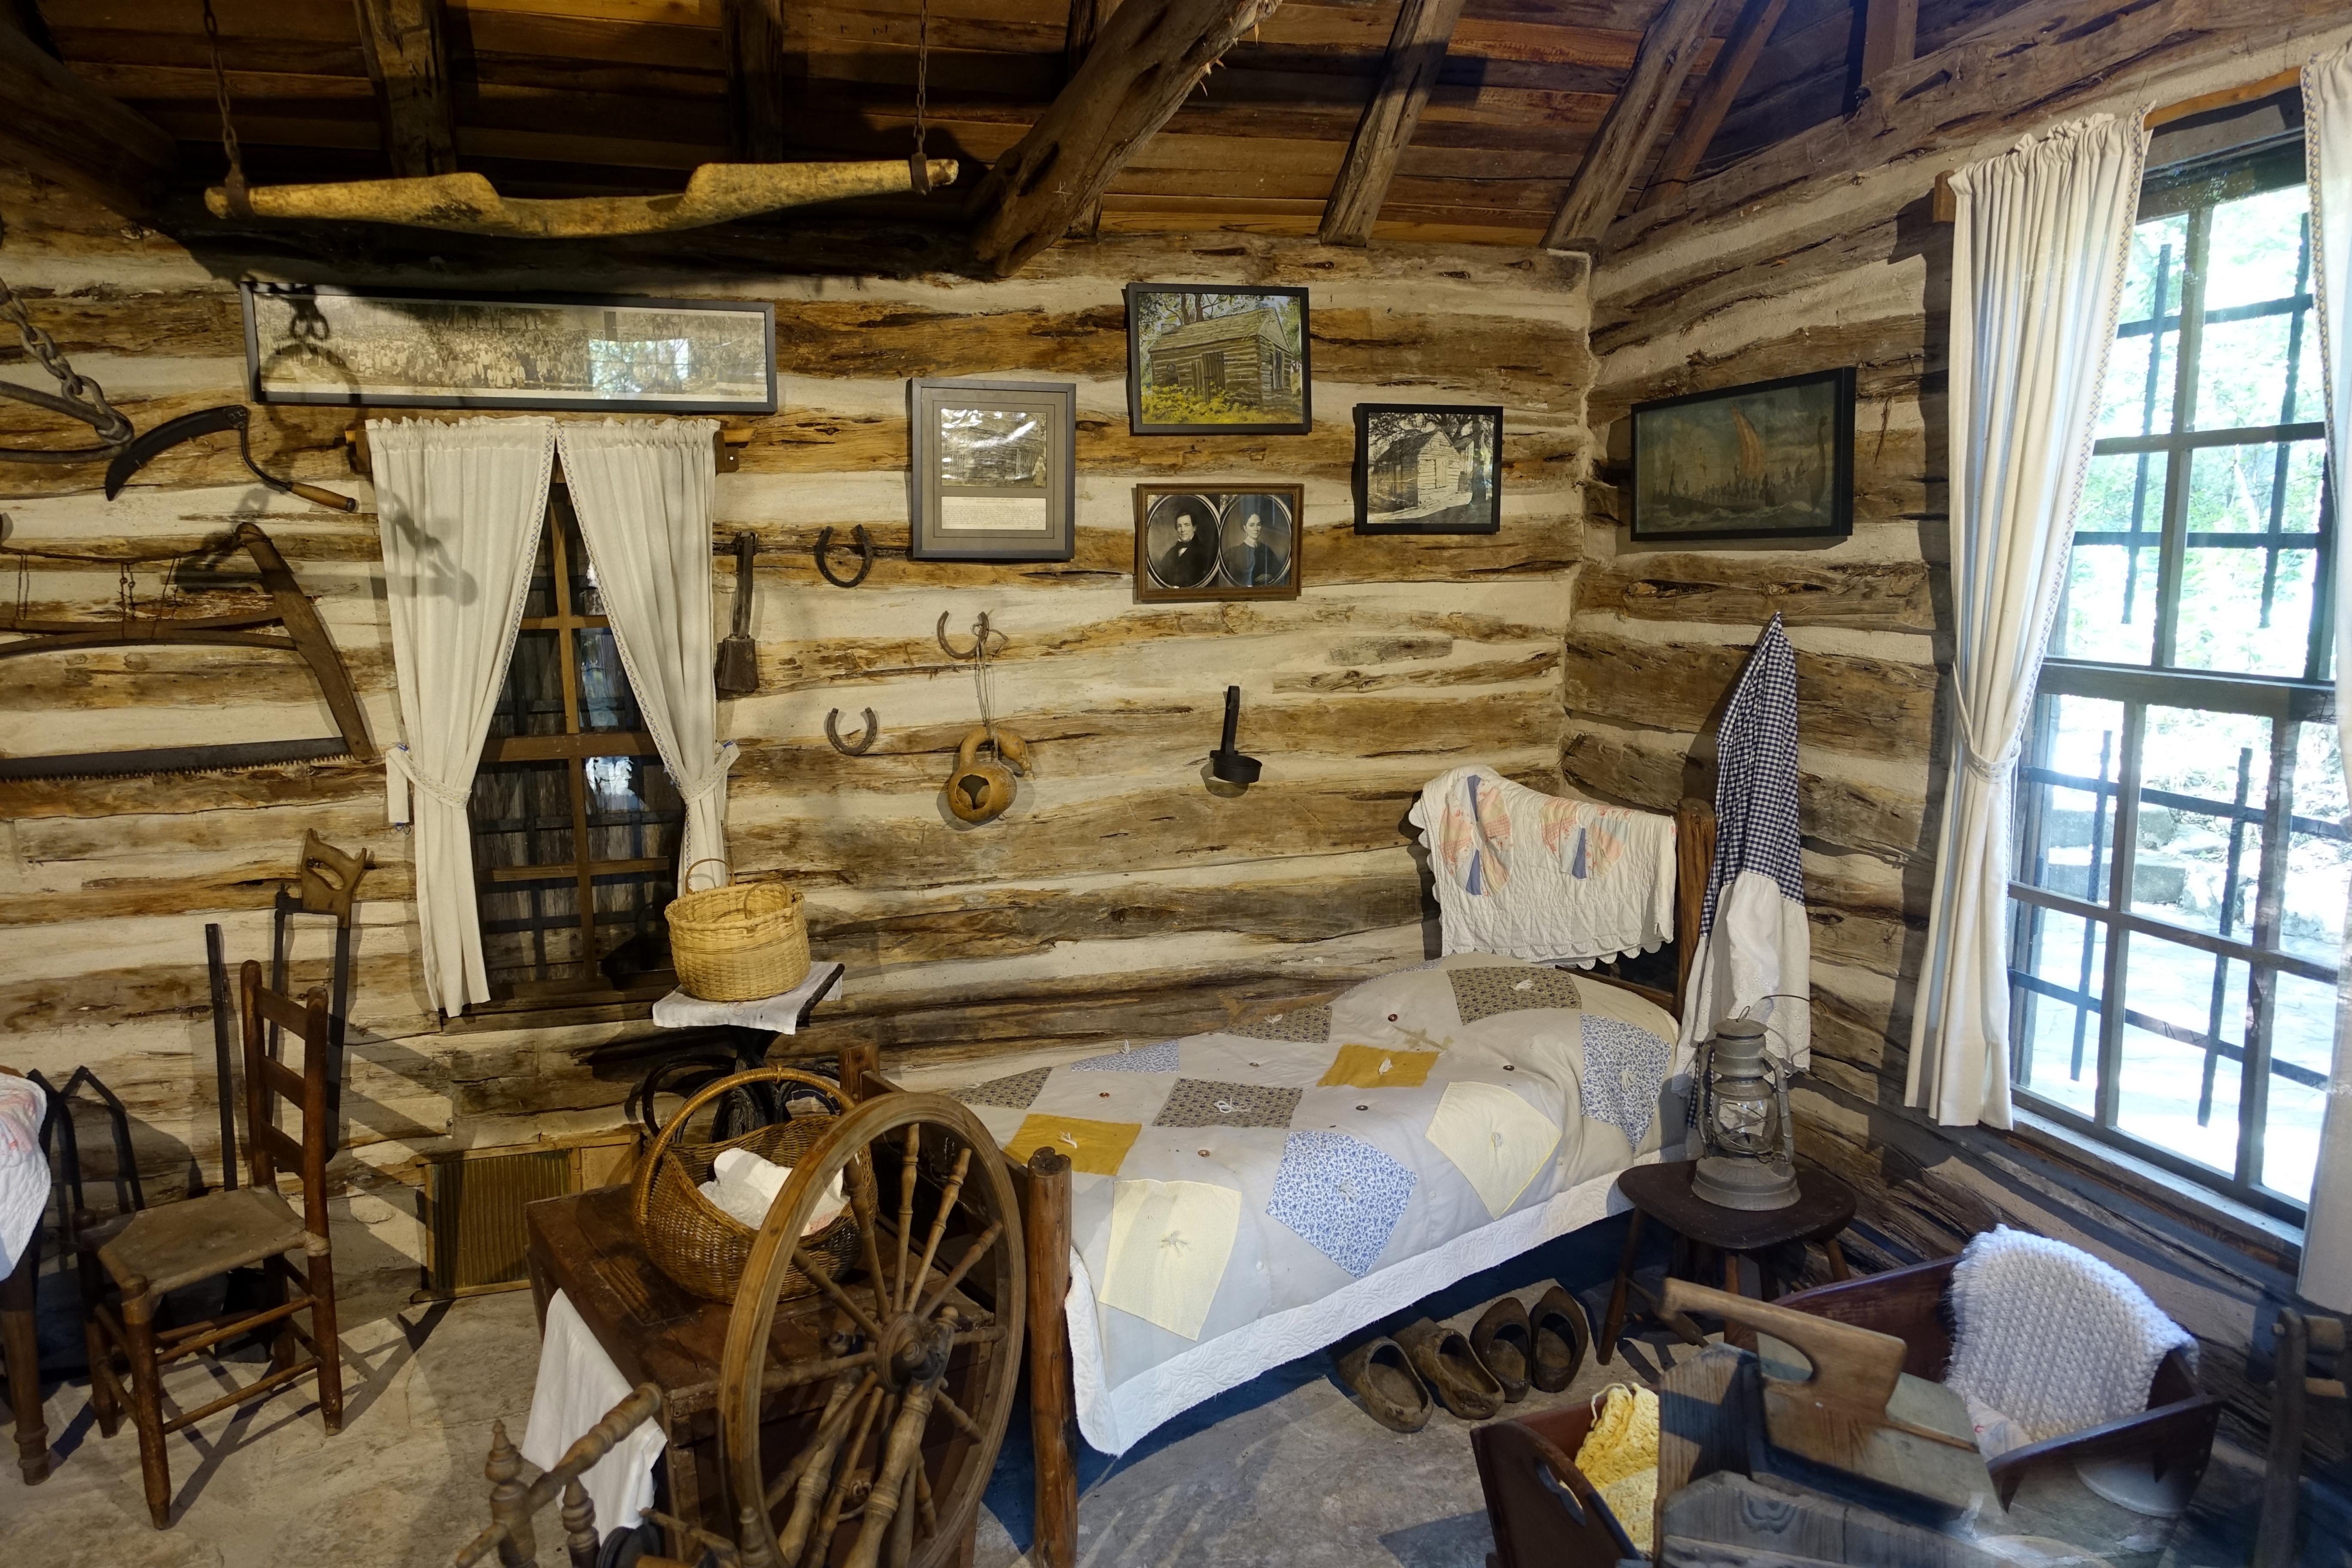 File:Interior view - Swedish Log Cabin - Zilker Botanical Garden ...